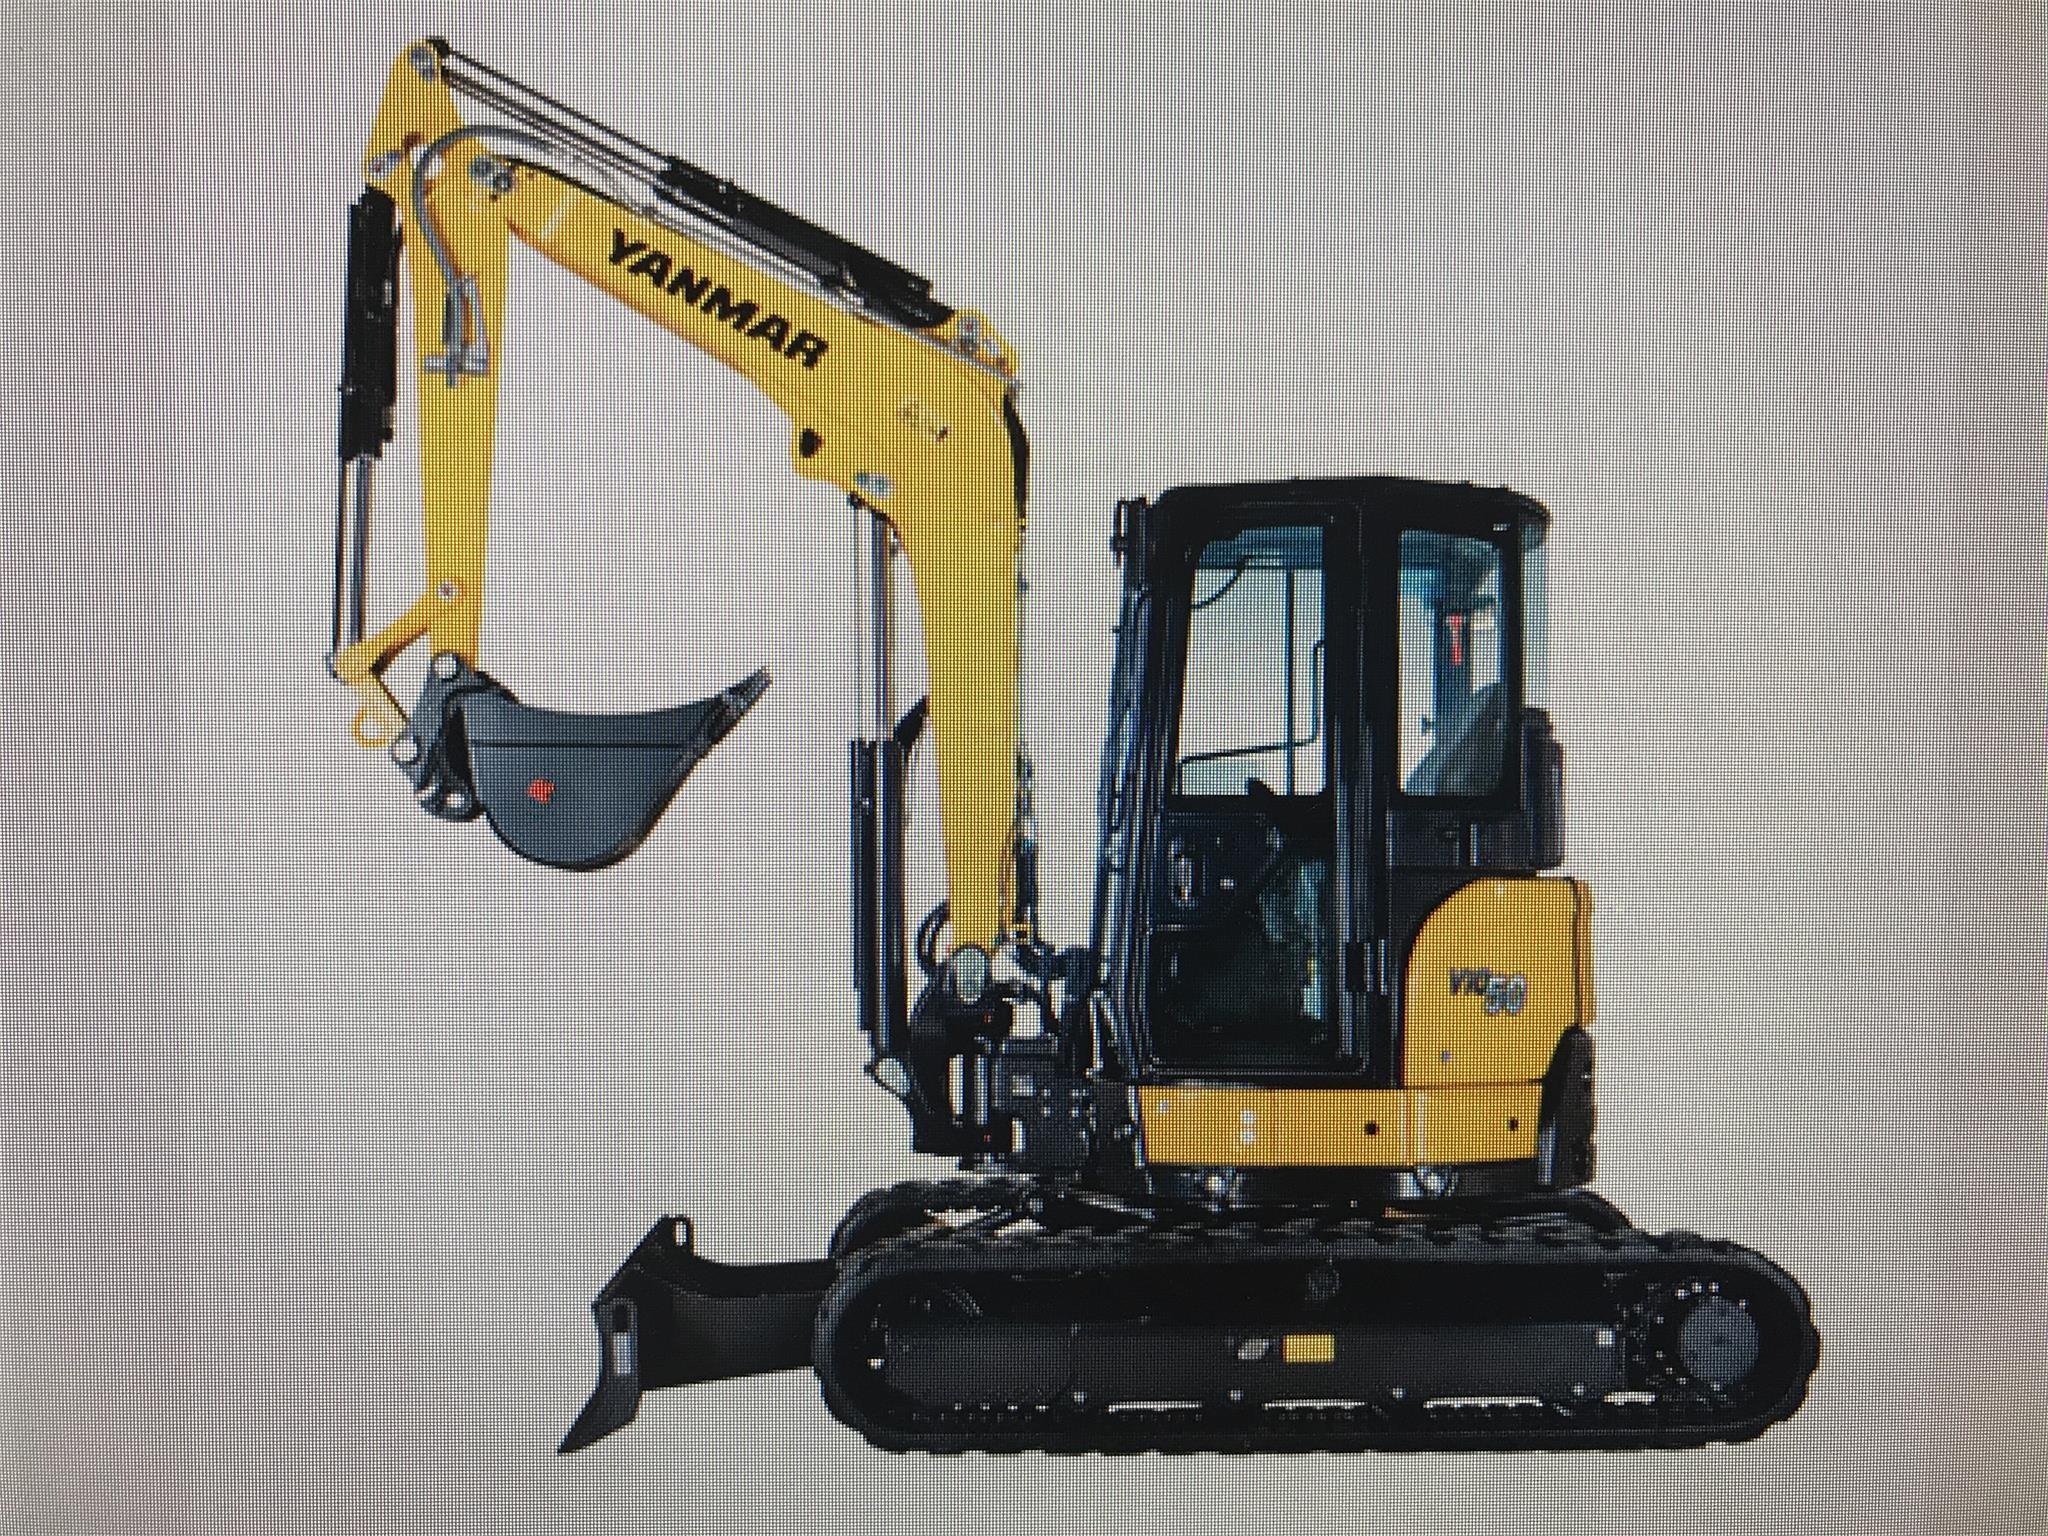 2020 Yanmar VIO50 Excavators and Mini Excavator